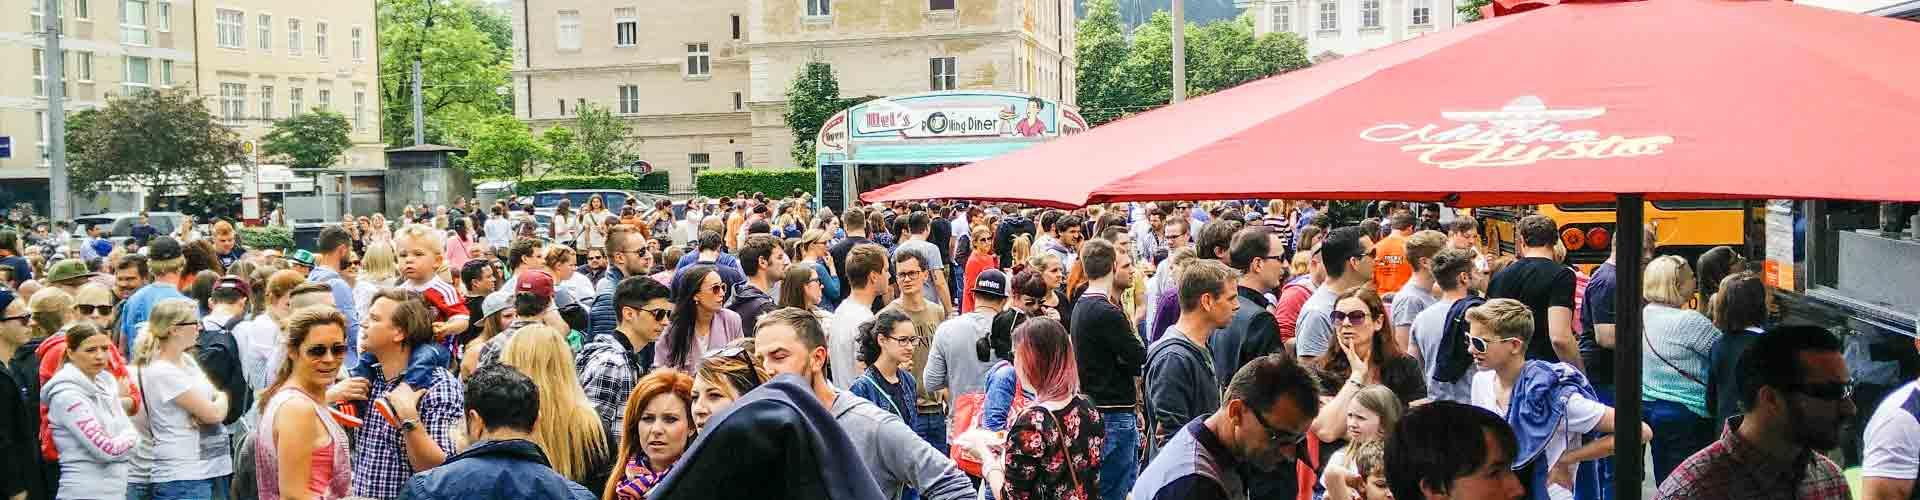 1. Food Truck RoundUp Salzburg am Samstag, 16. Mai 2015